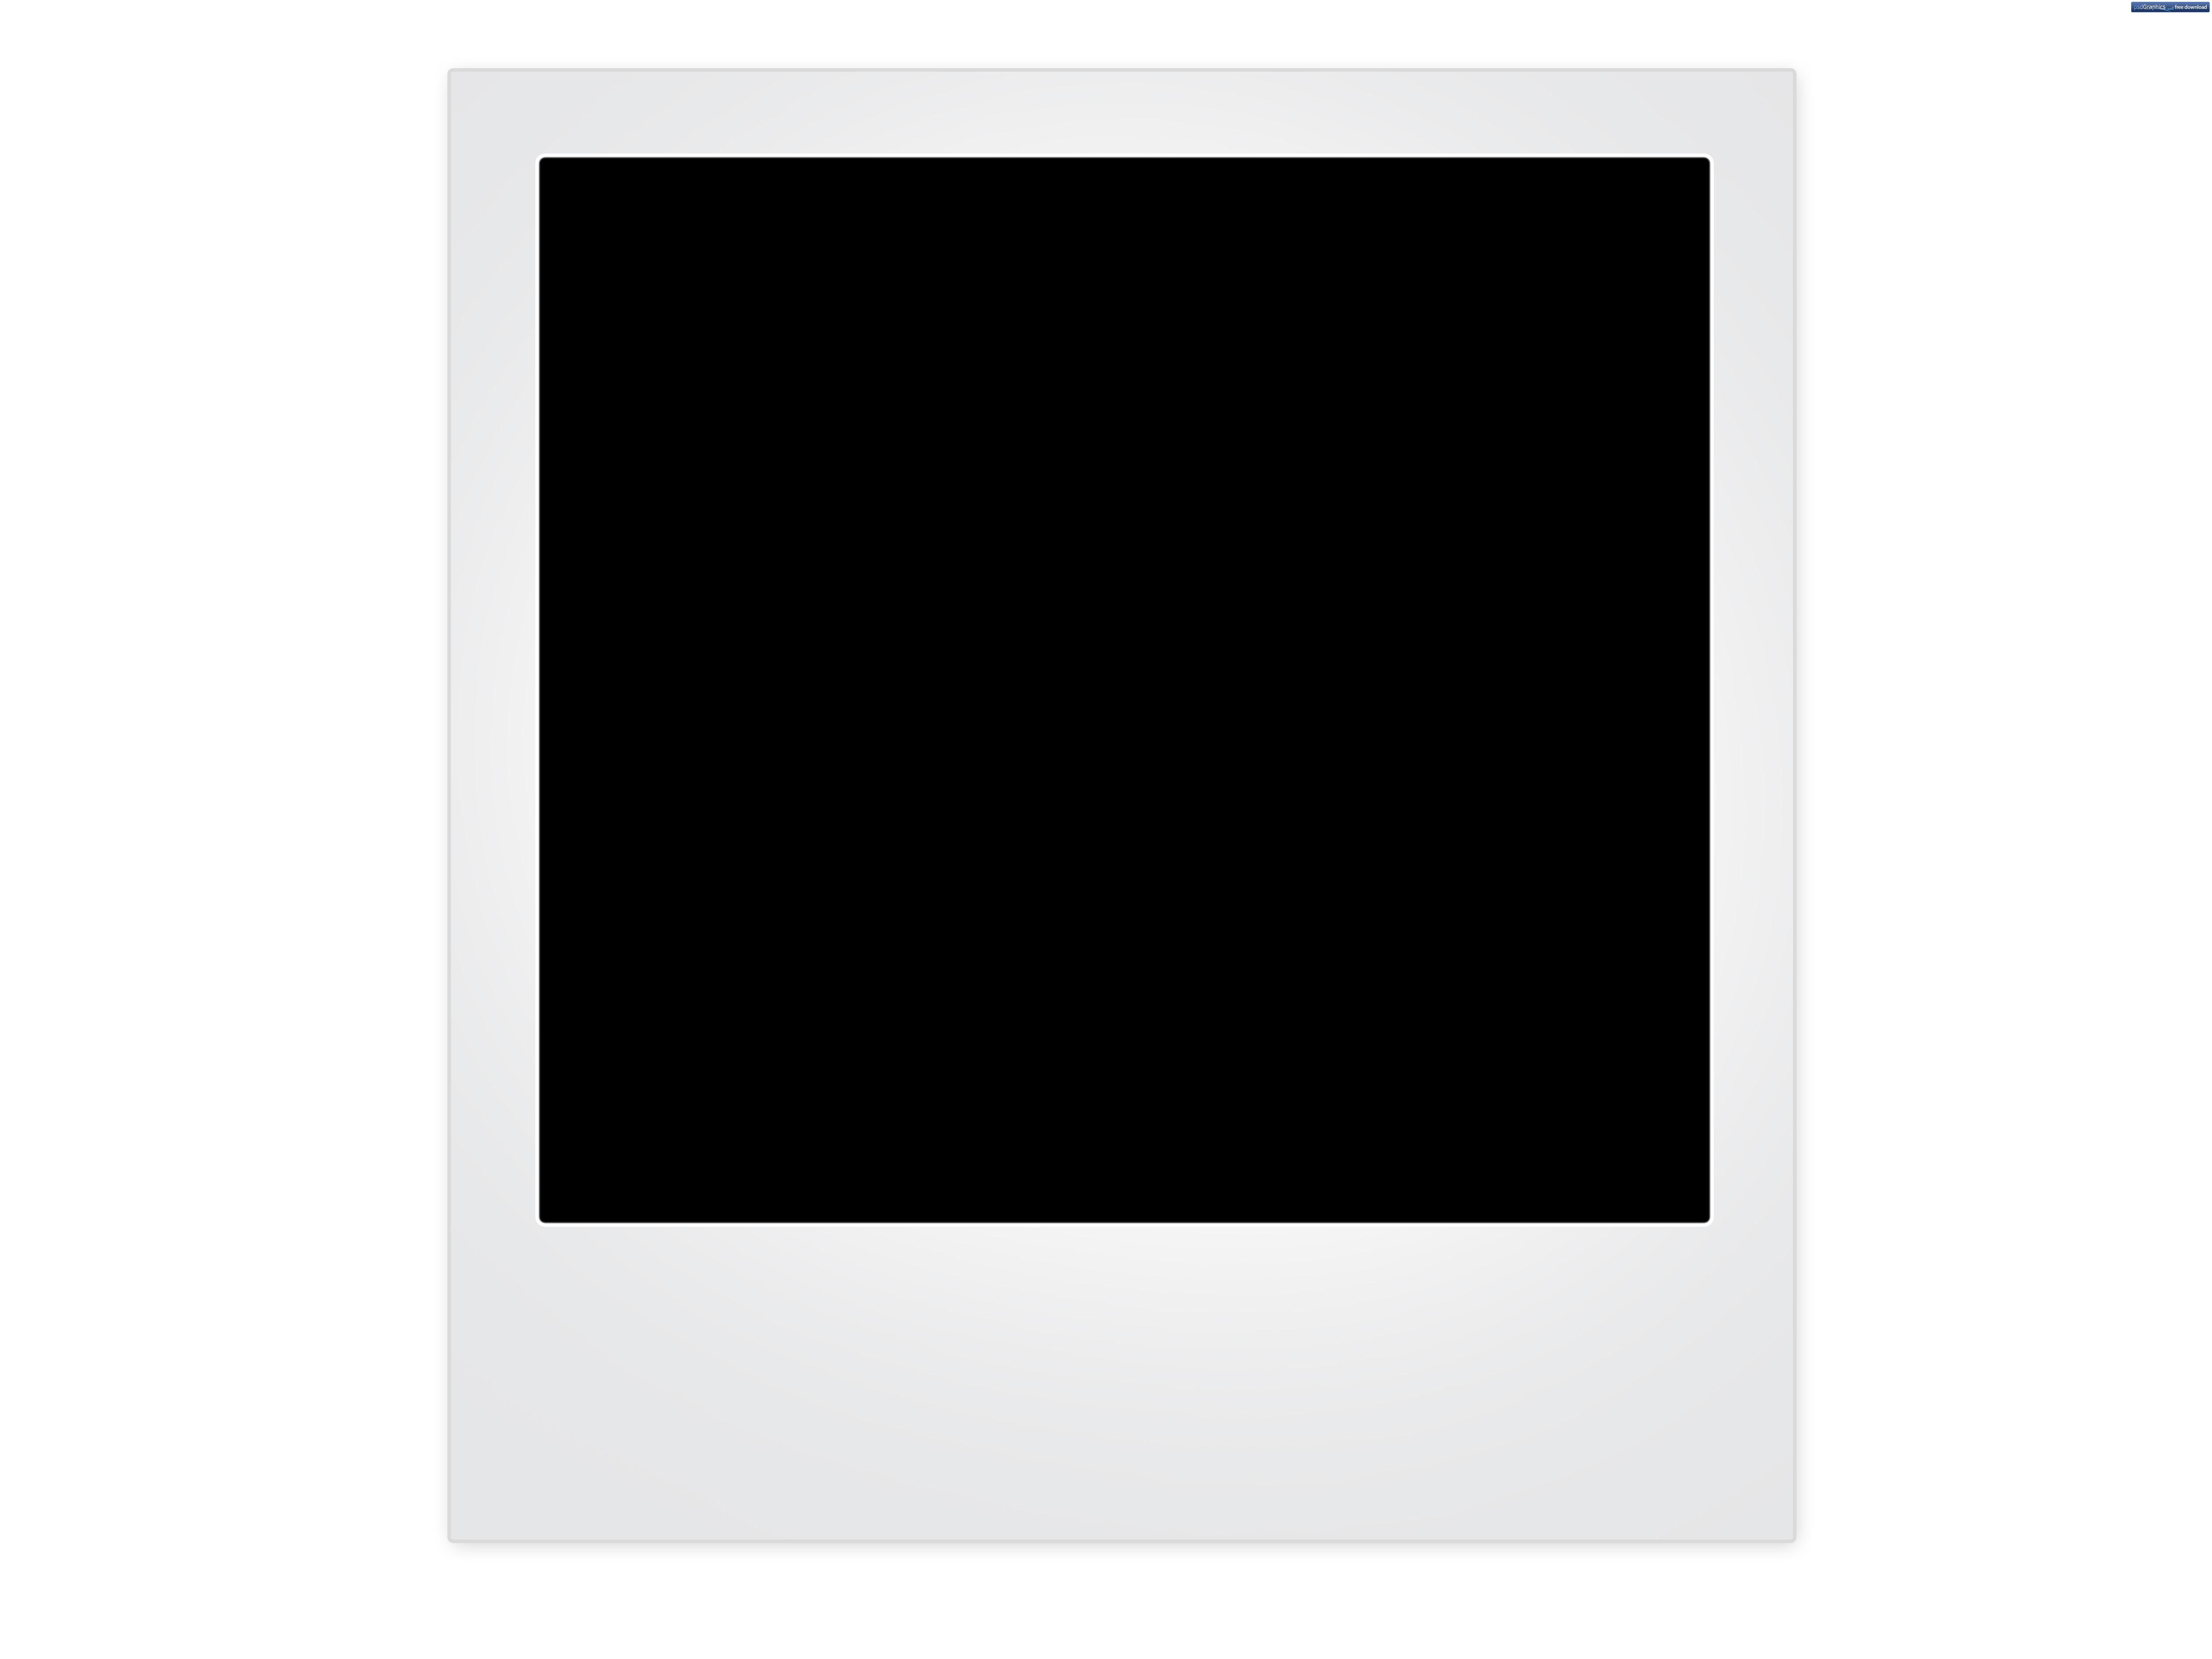 11 polaroid frames psd templates images polaroid frame template